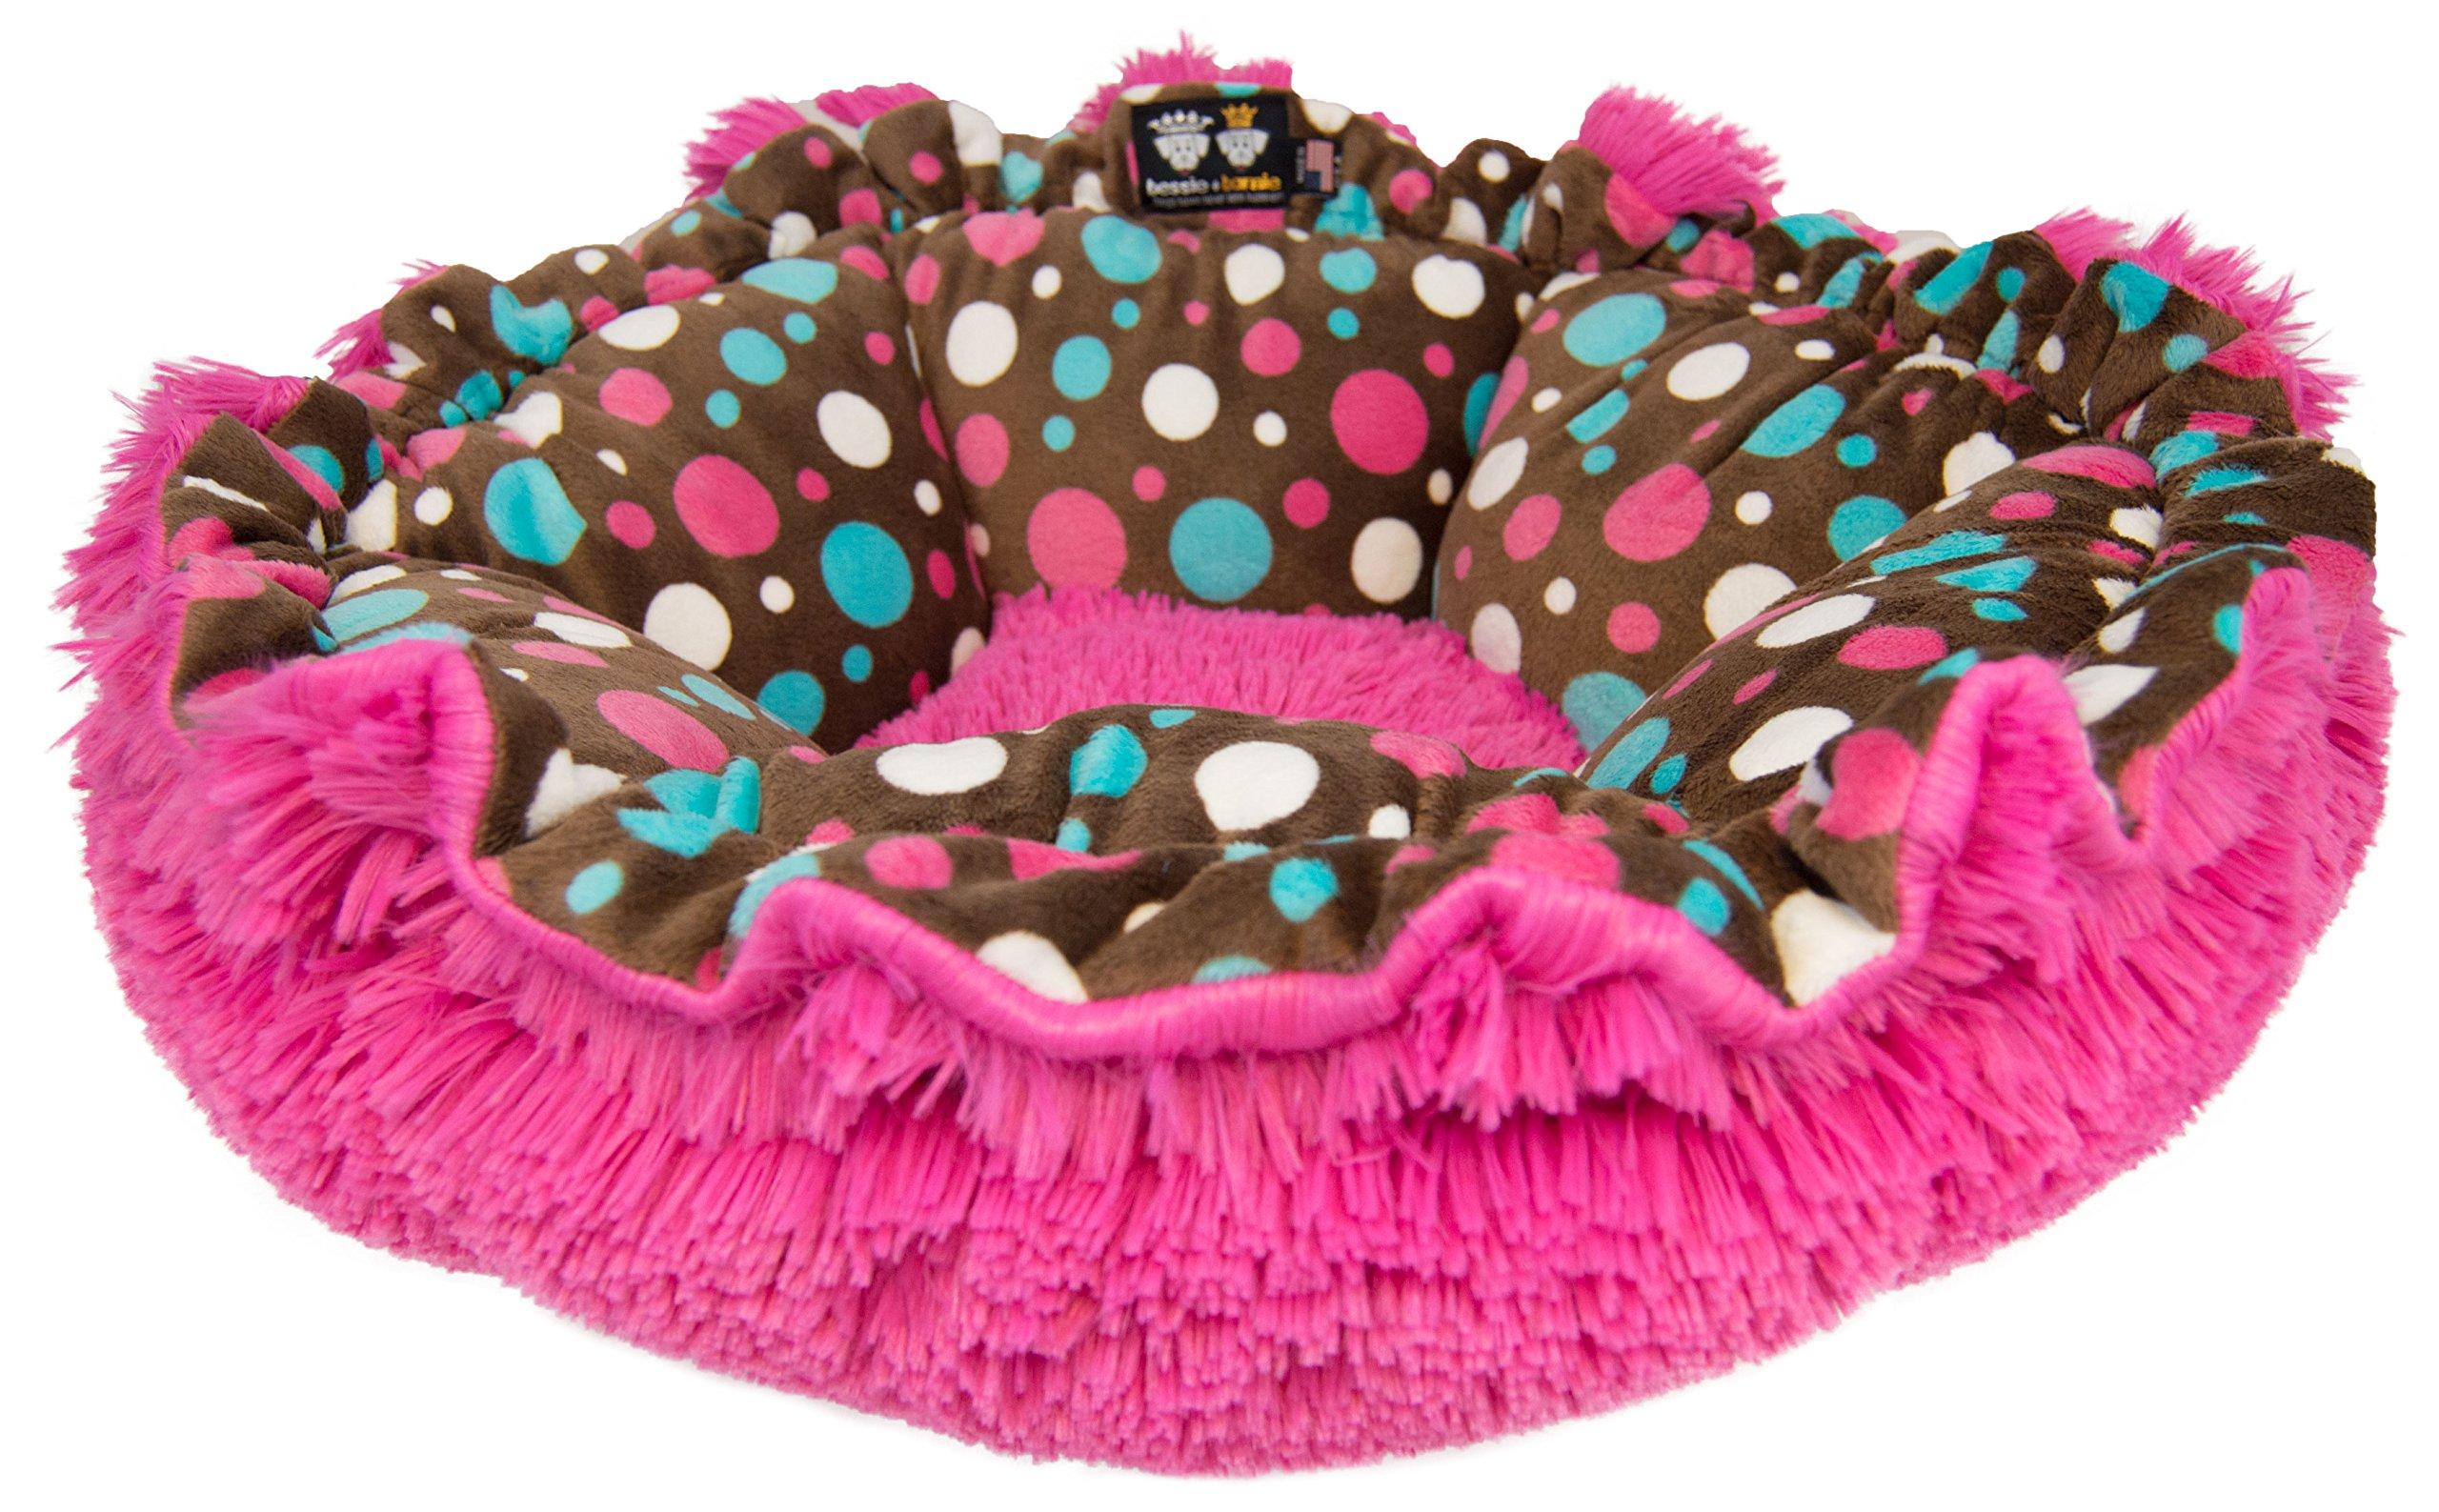 BESSIE AND BARNIE Ultra Plush Cake Pop/Lollipop Luxury Shag Deluxe Dog/Pet Cuddle Pod Bed by BESSIE AND BARNIE